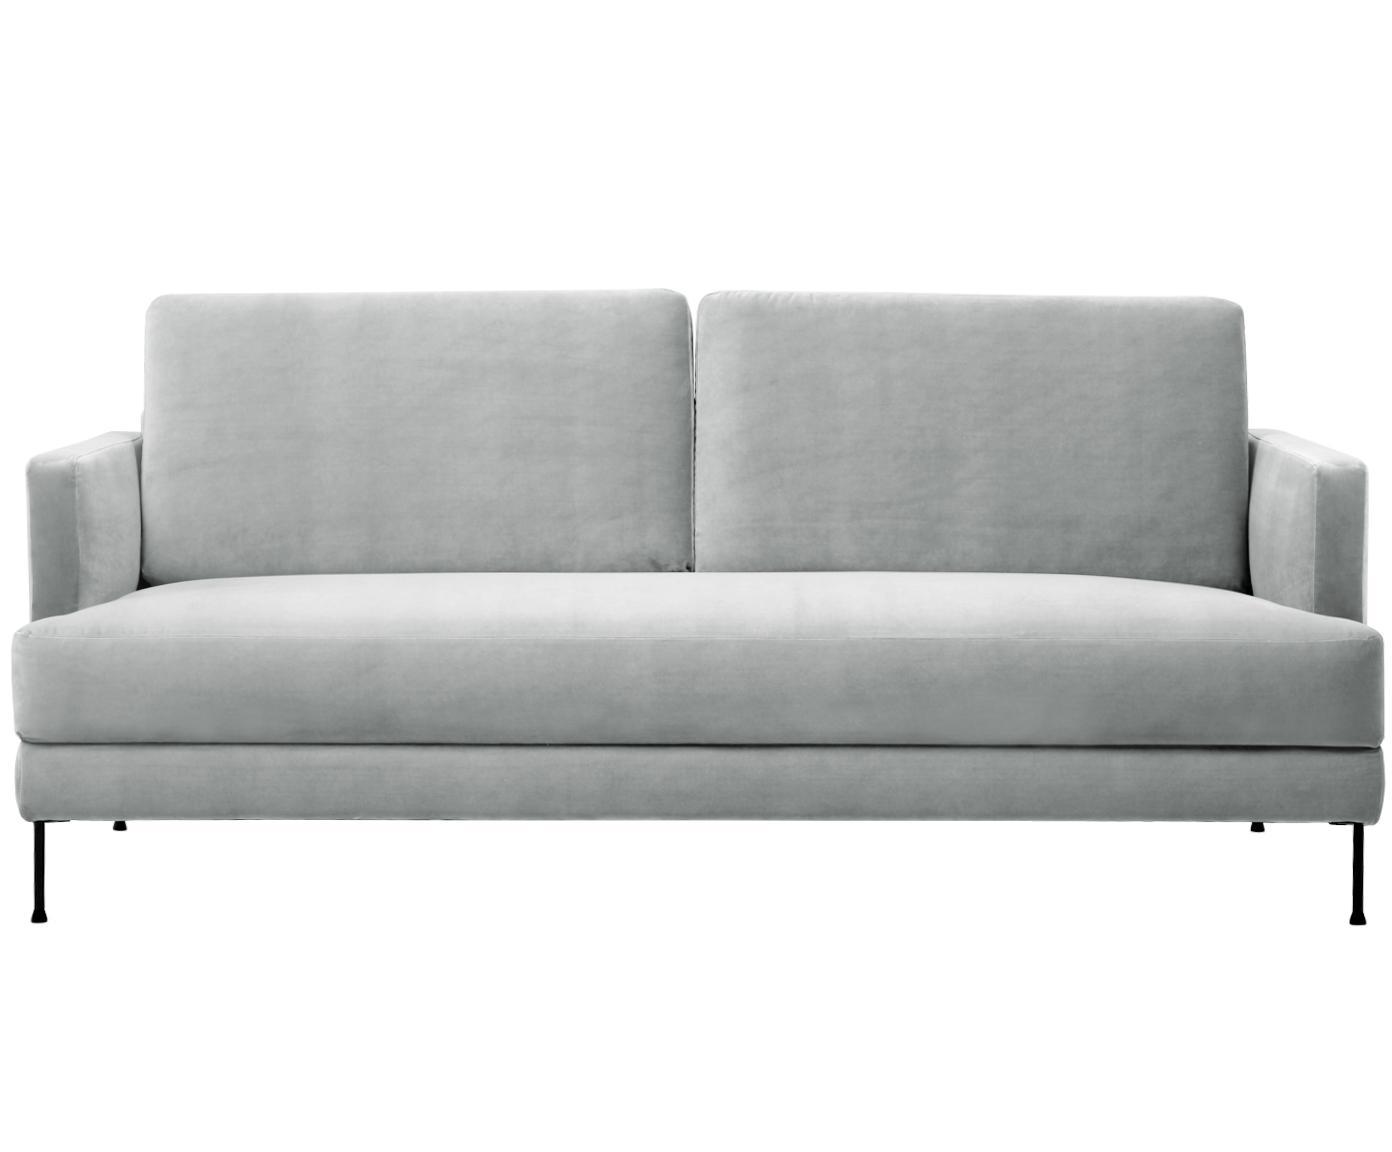 Samt-Sofa Fluente (3-Sitzer), Bezug: Samt (Hochwertiger Polyes, Gestell: Massives Kiefernholz, Samt Hellgrau, B 197 x T 83 cm